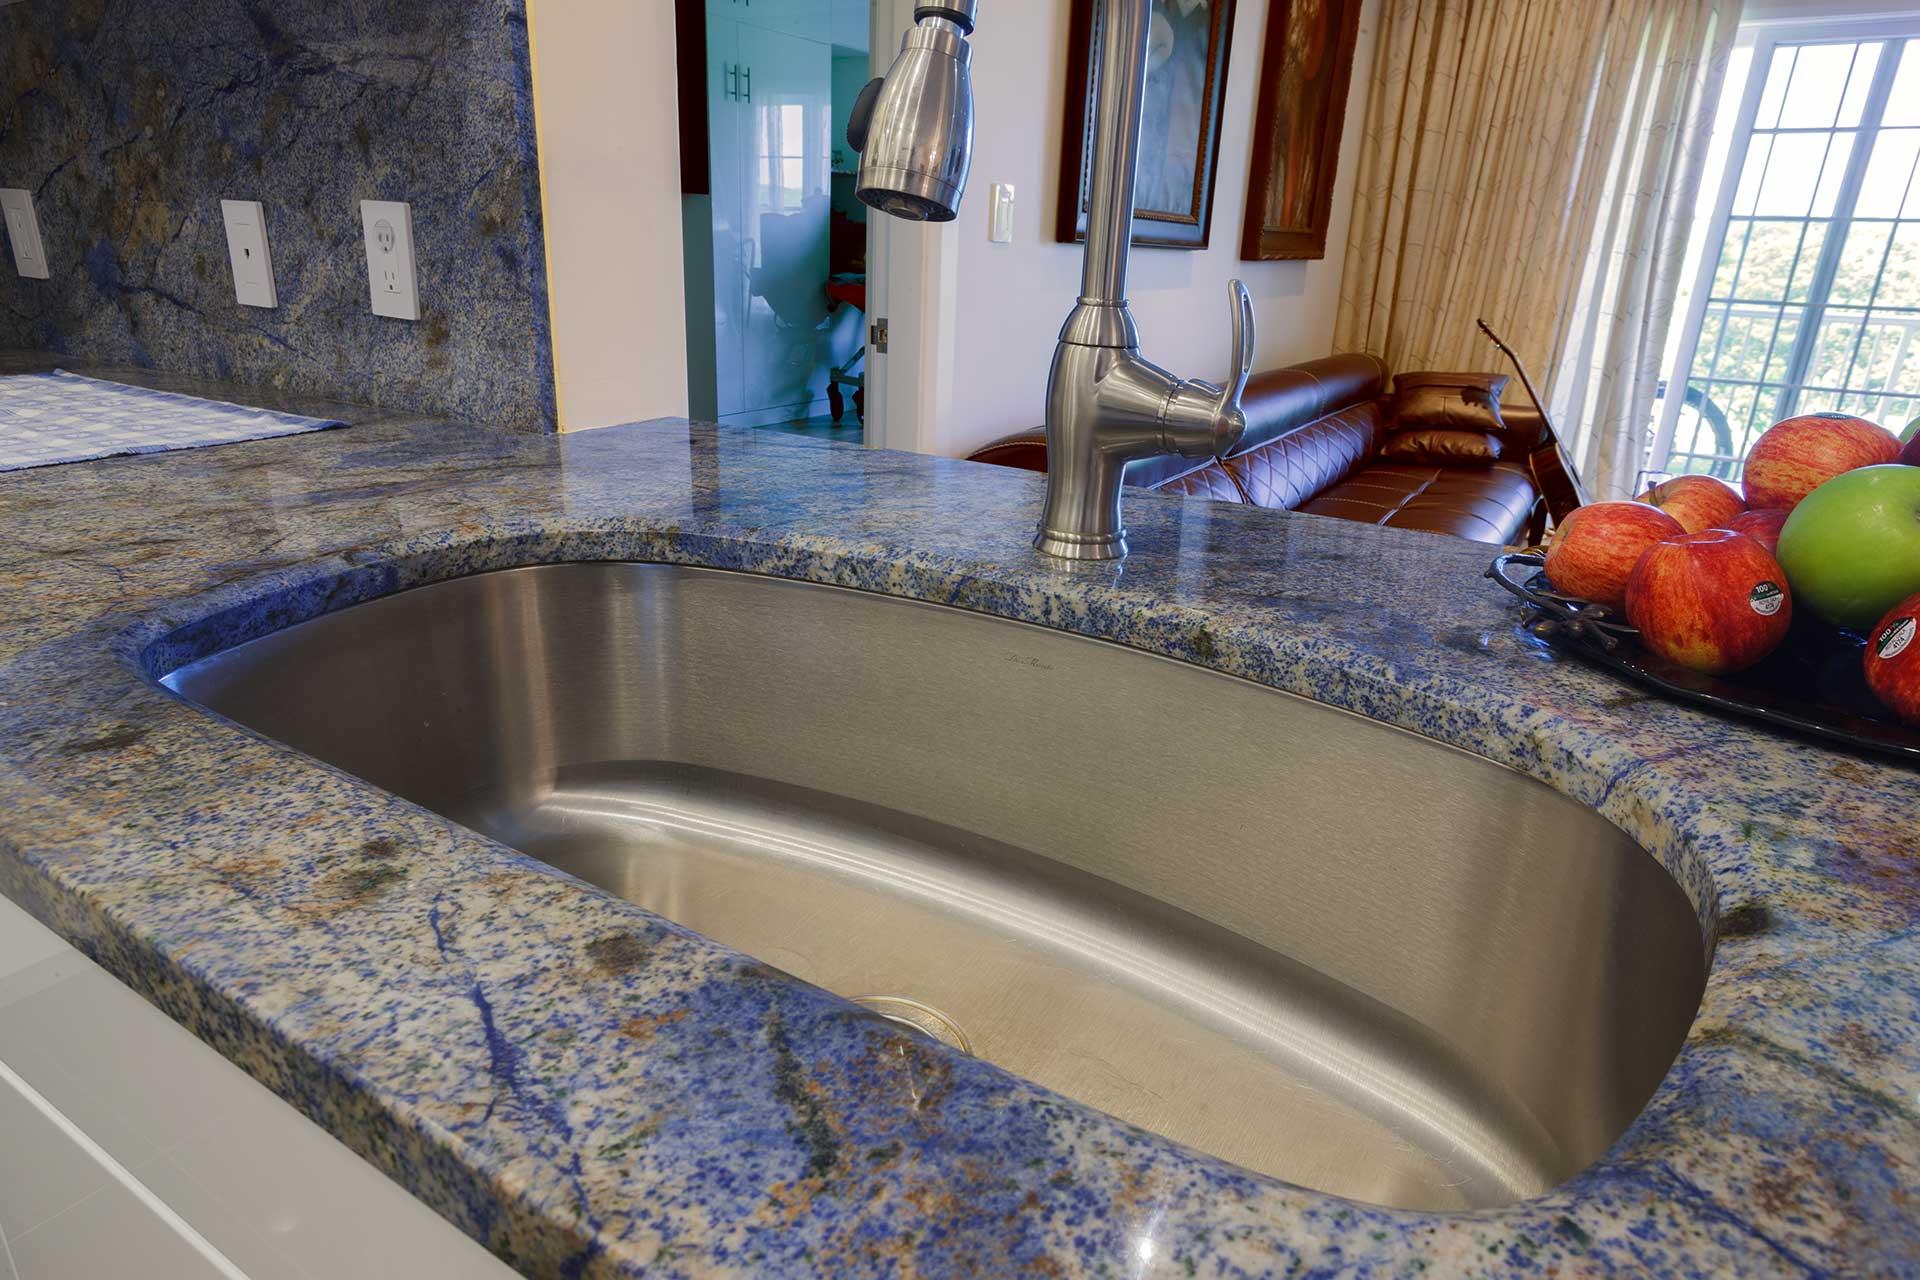 Long Crescent Sink